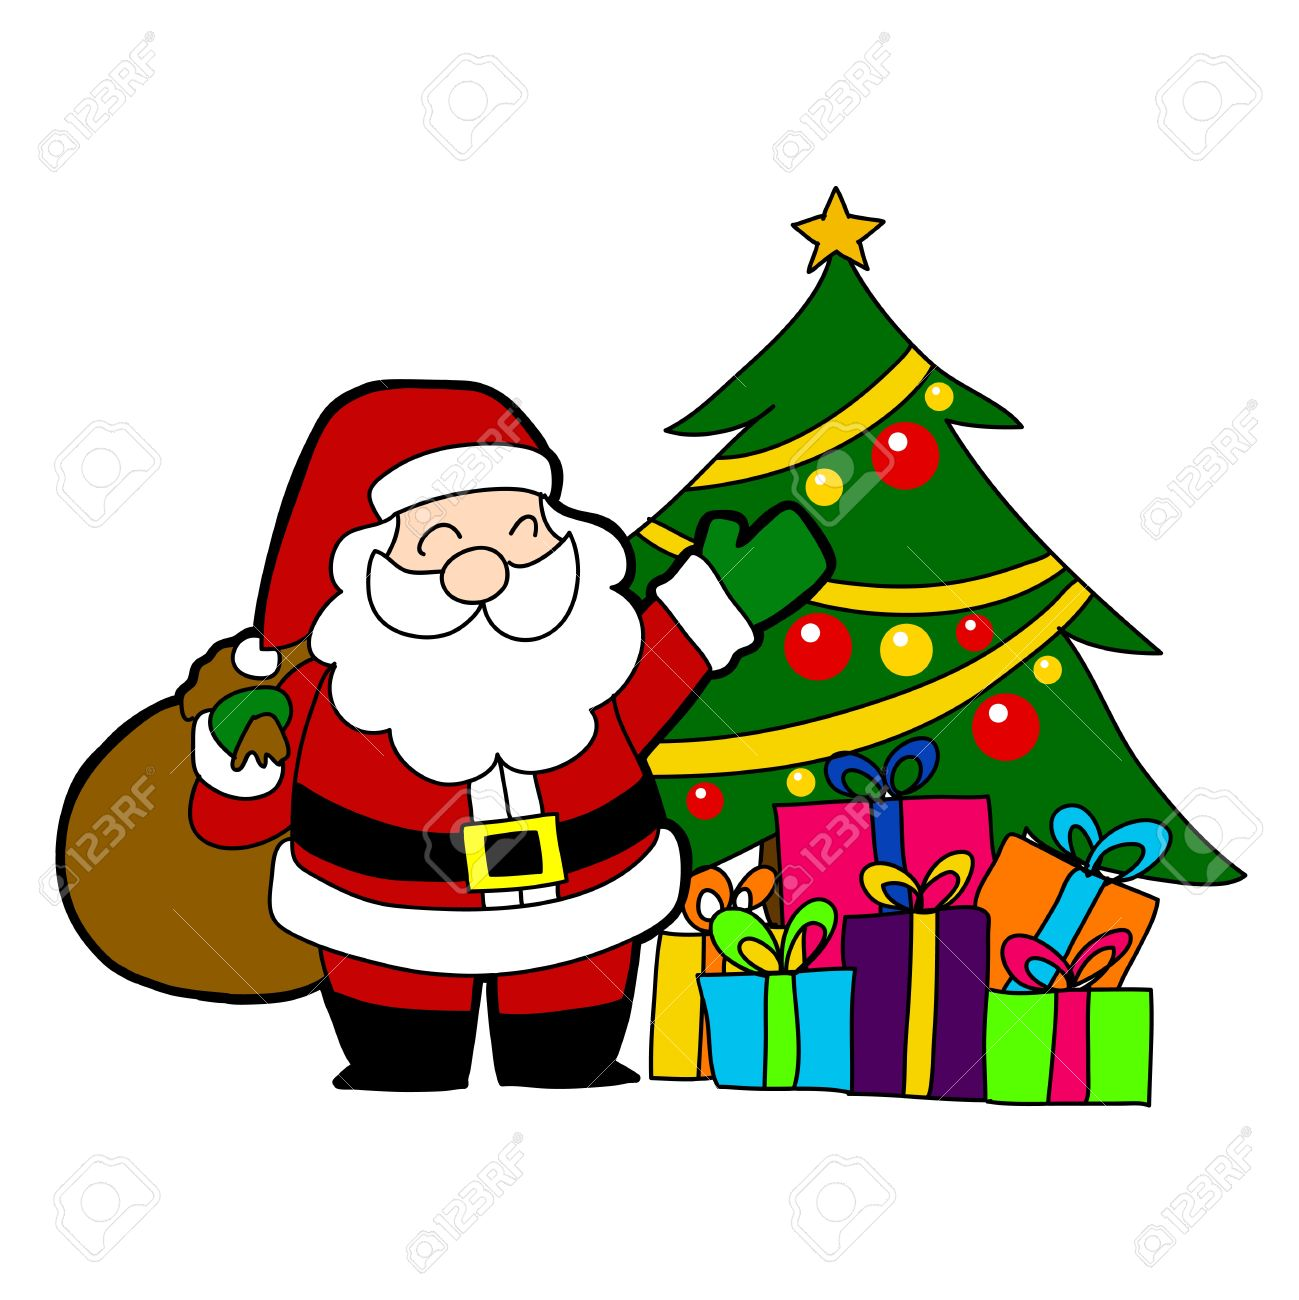 cartoon santa claus - Santa Santa Claus